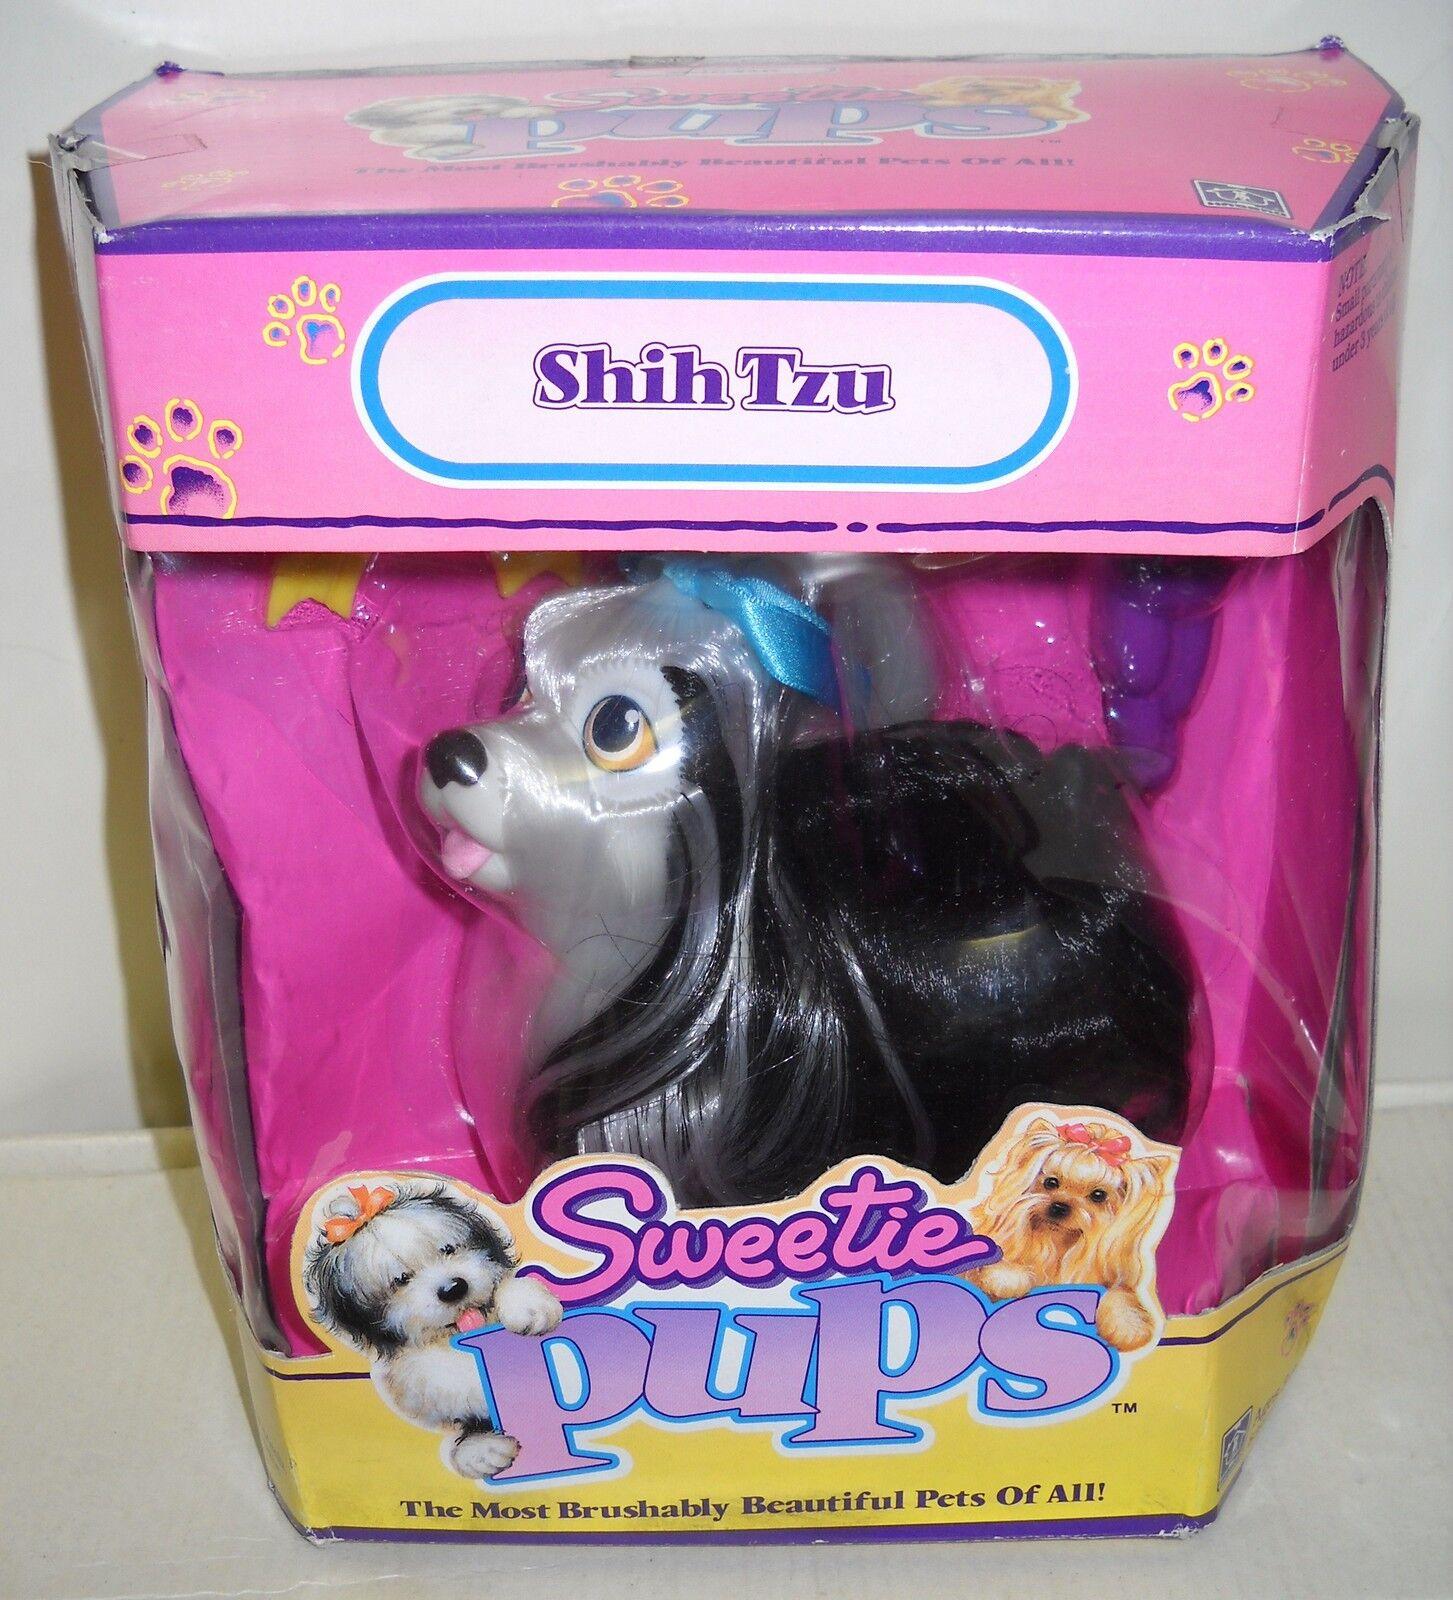 Nrfb Vintage Hasbro cariño Cachorros Shih Tzu Perro